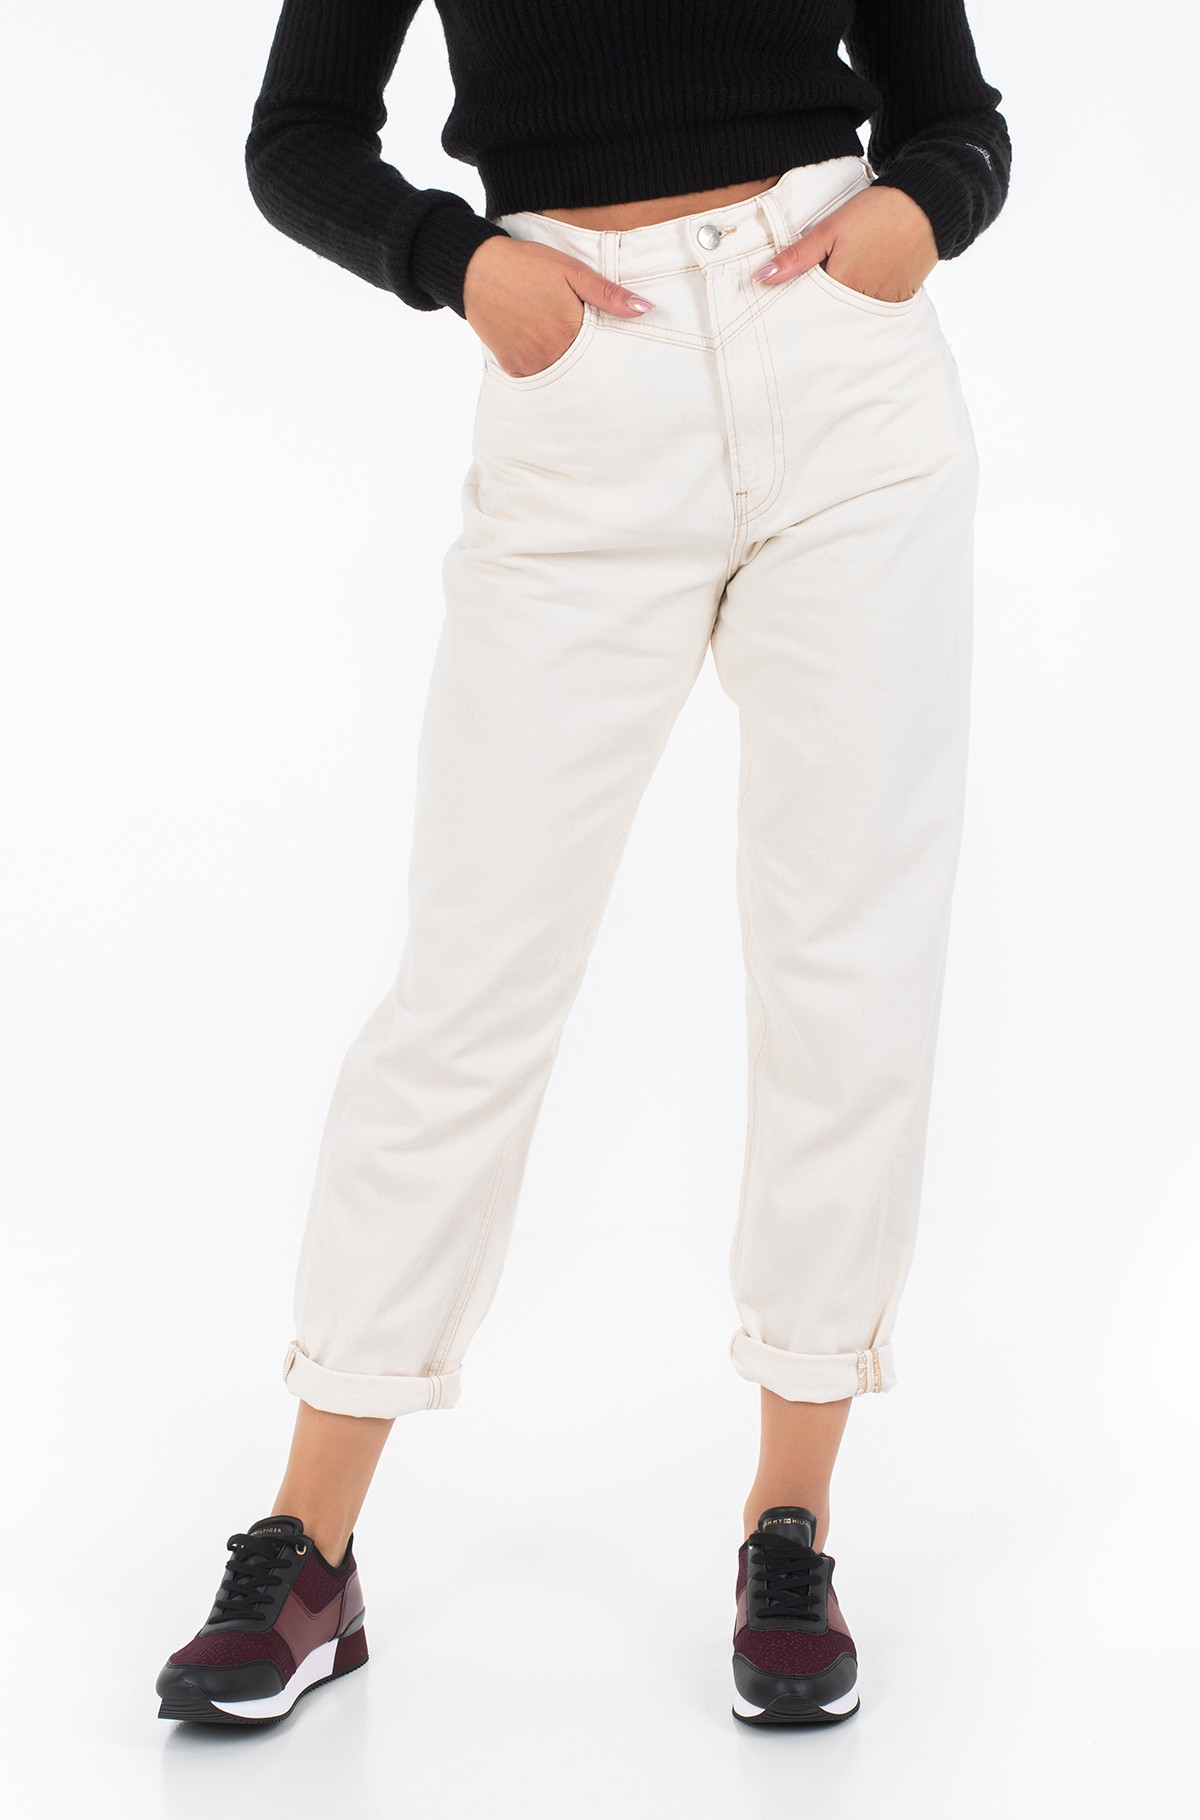 Džinsinės kelnės RACHEL/PL203599-full-1